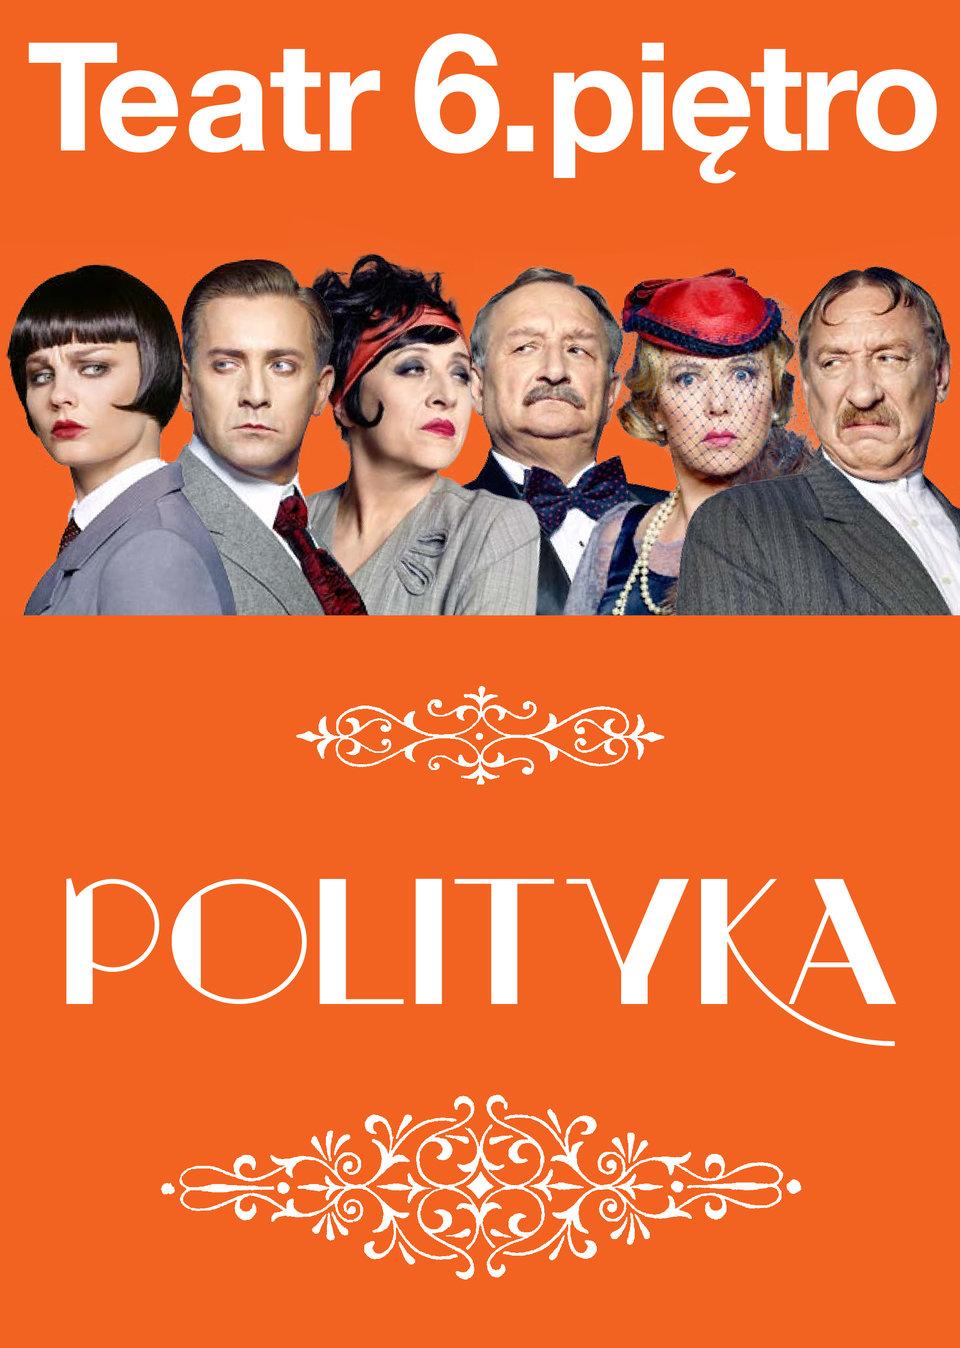 PROGRAM-POLITYKA-16_000.jpg